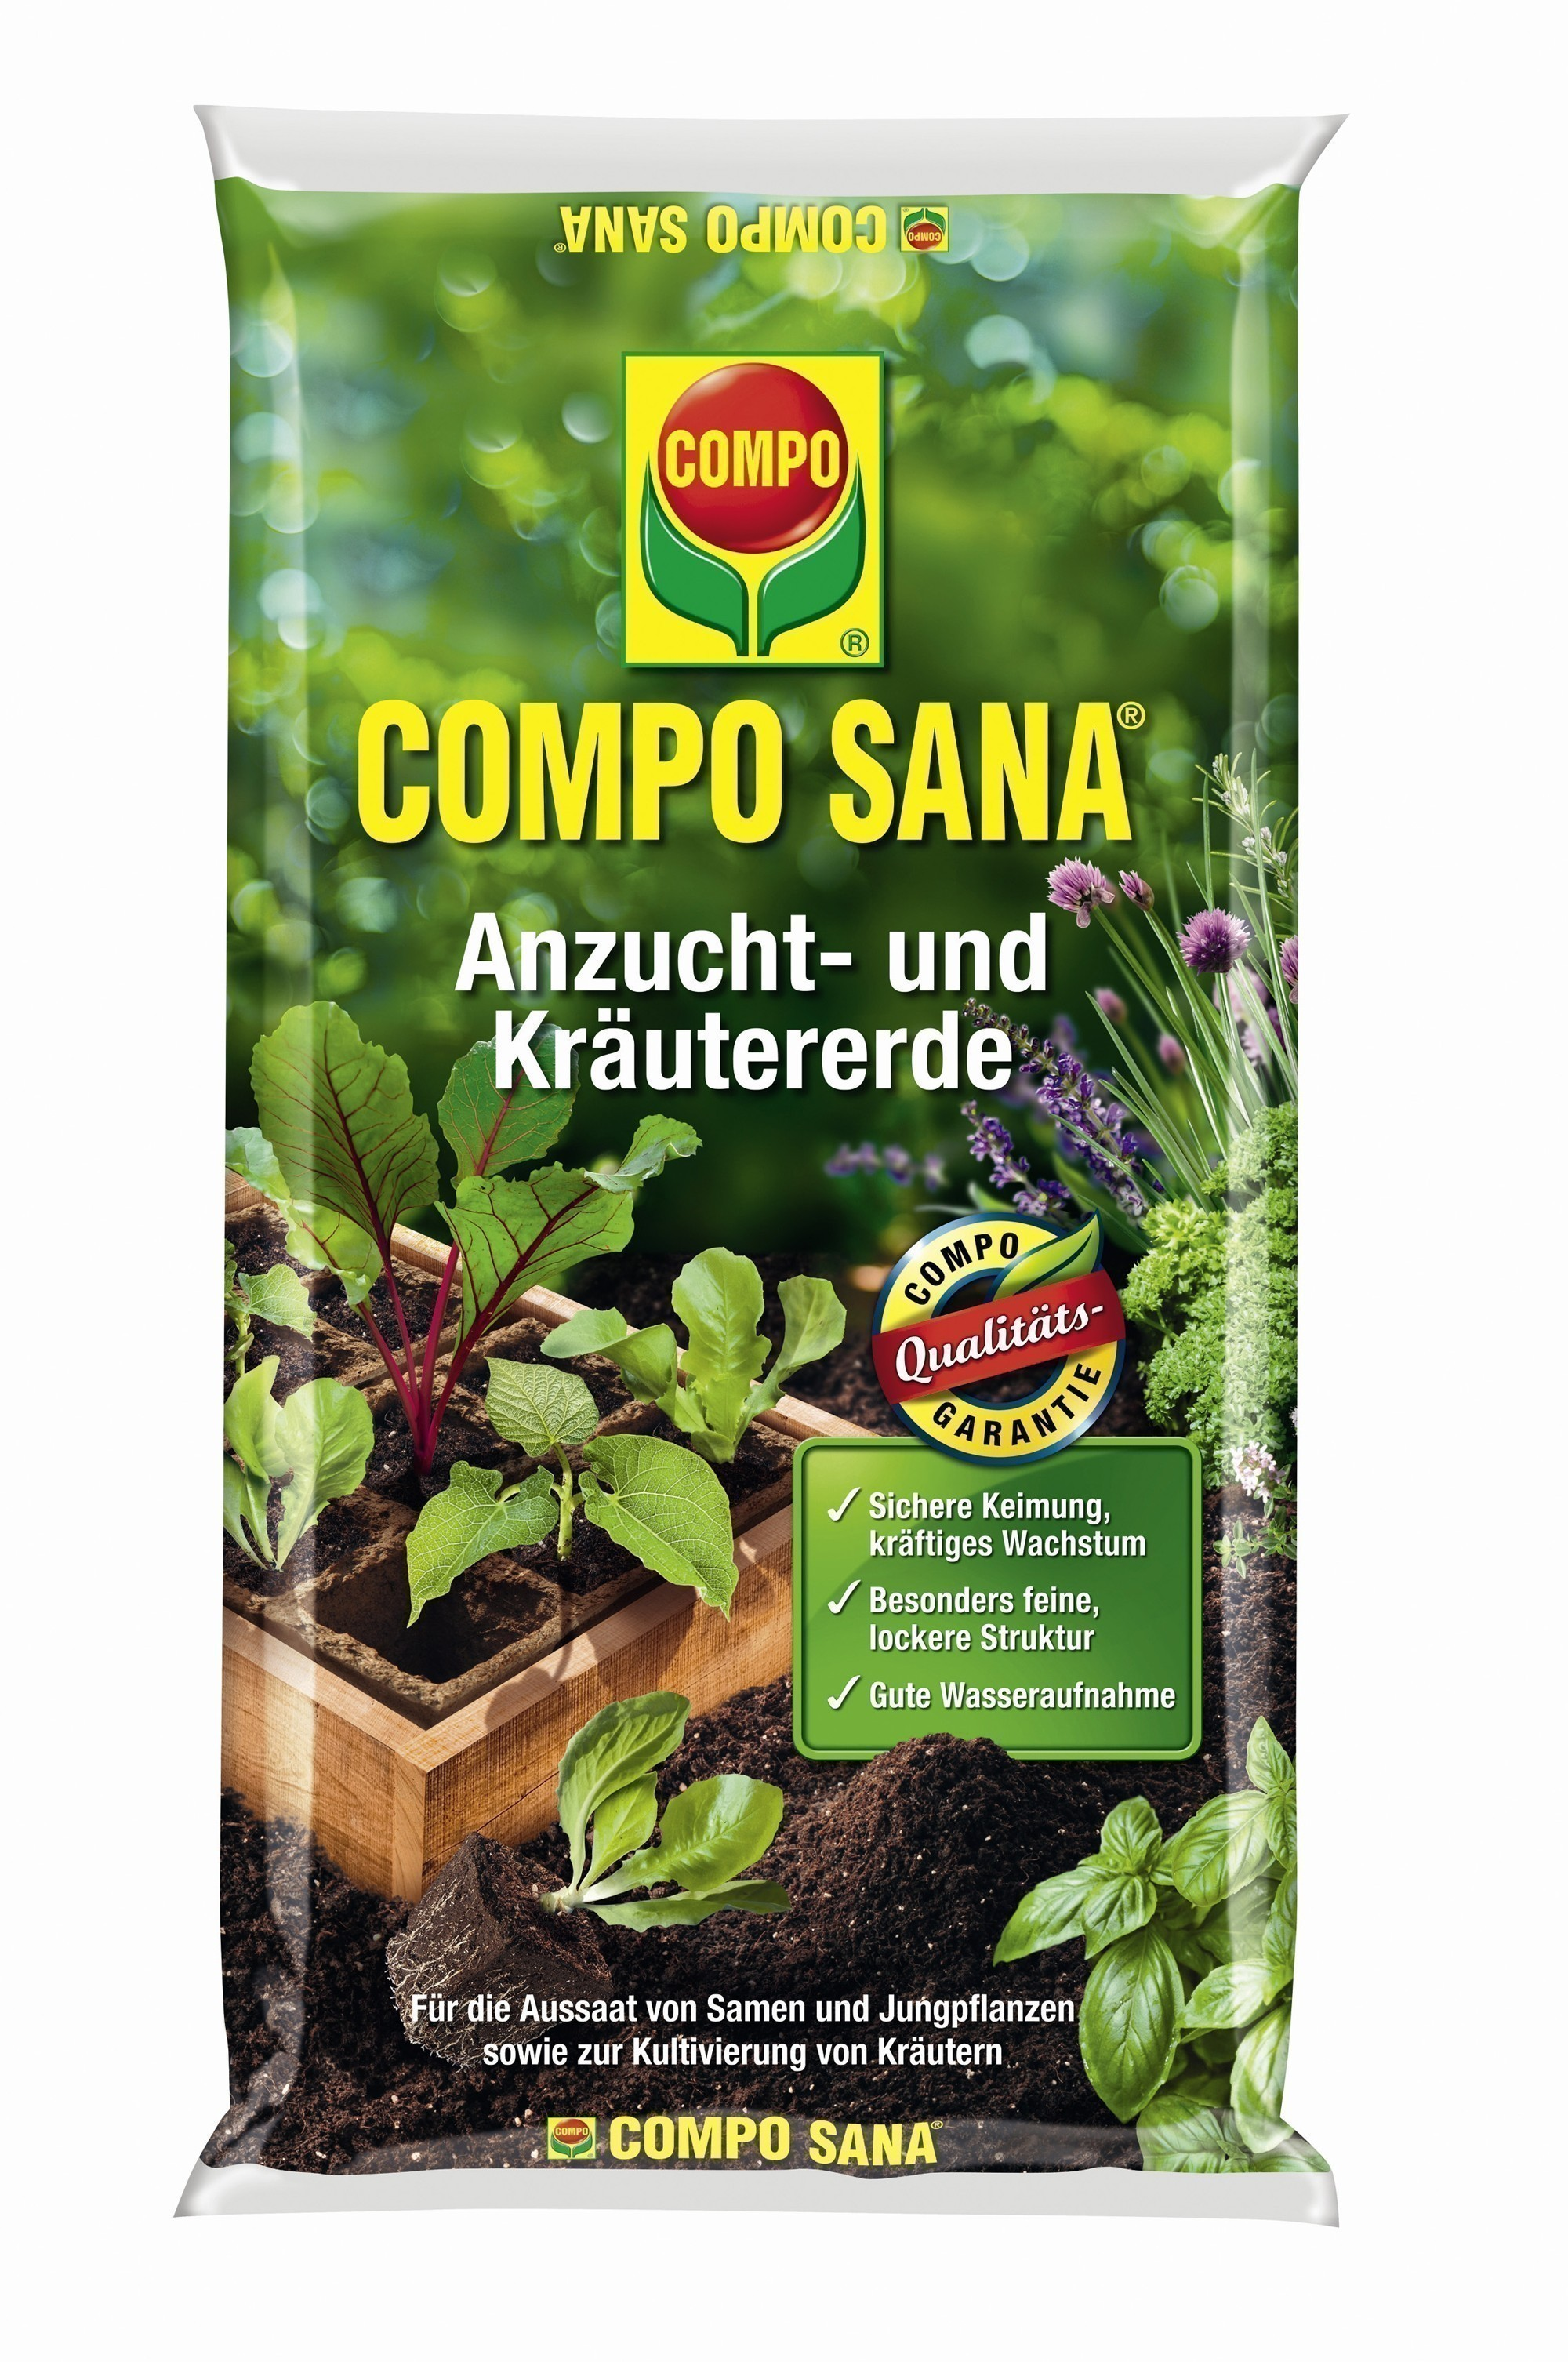 COMPO SANA Anzucht- und Kräutererde 10L Bild 1